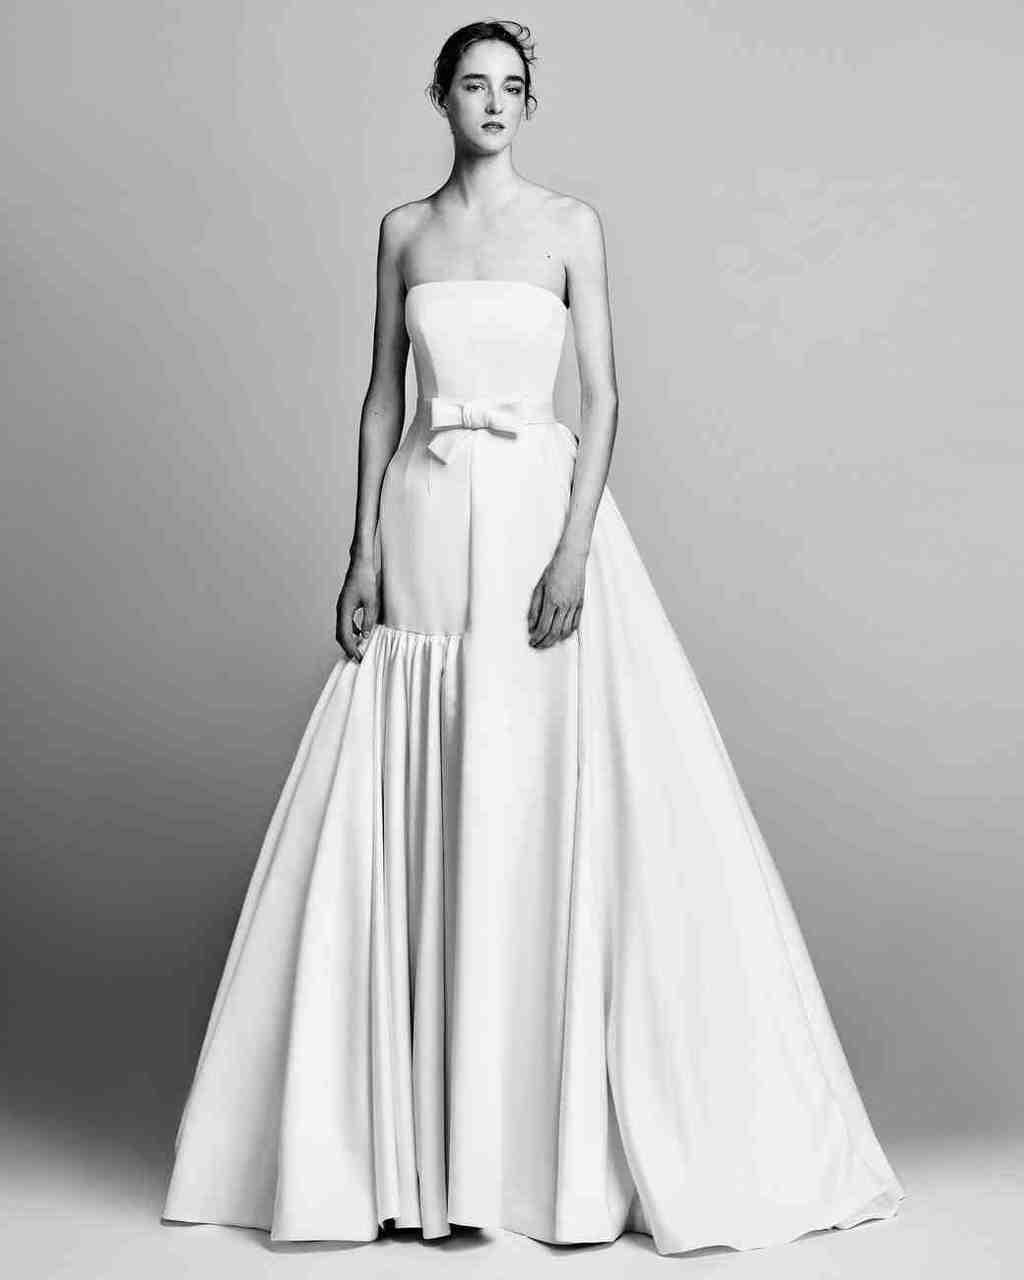 viktor-and-rolf-fall-2017-wedding-dress-006_vert-1